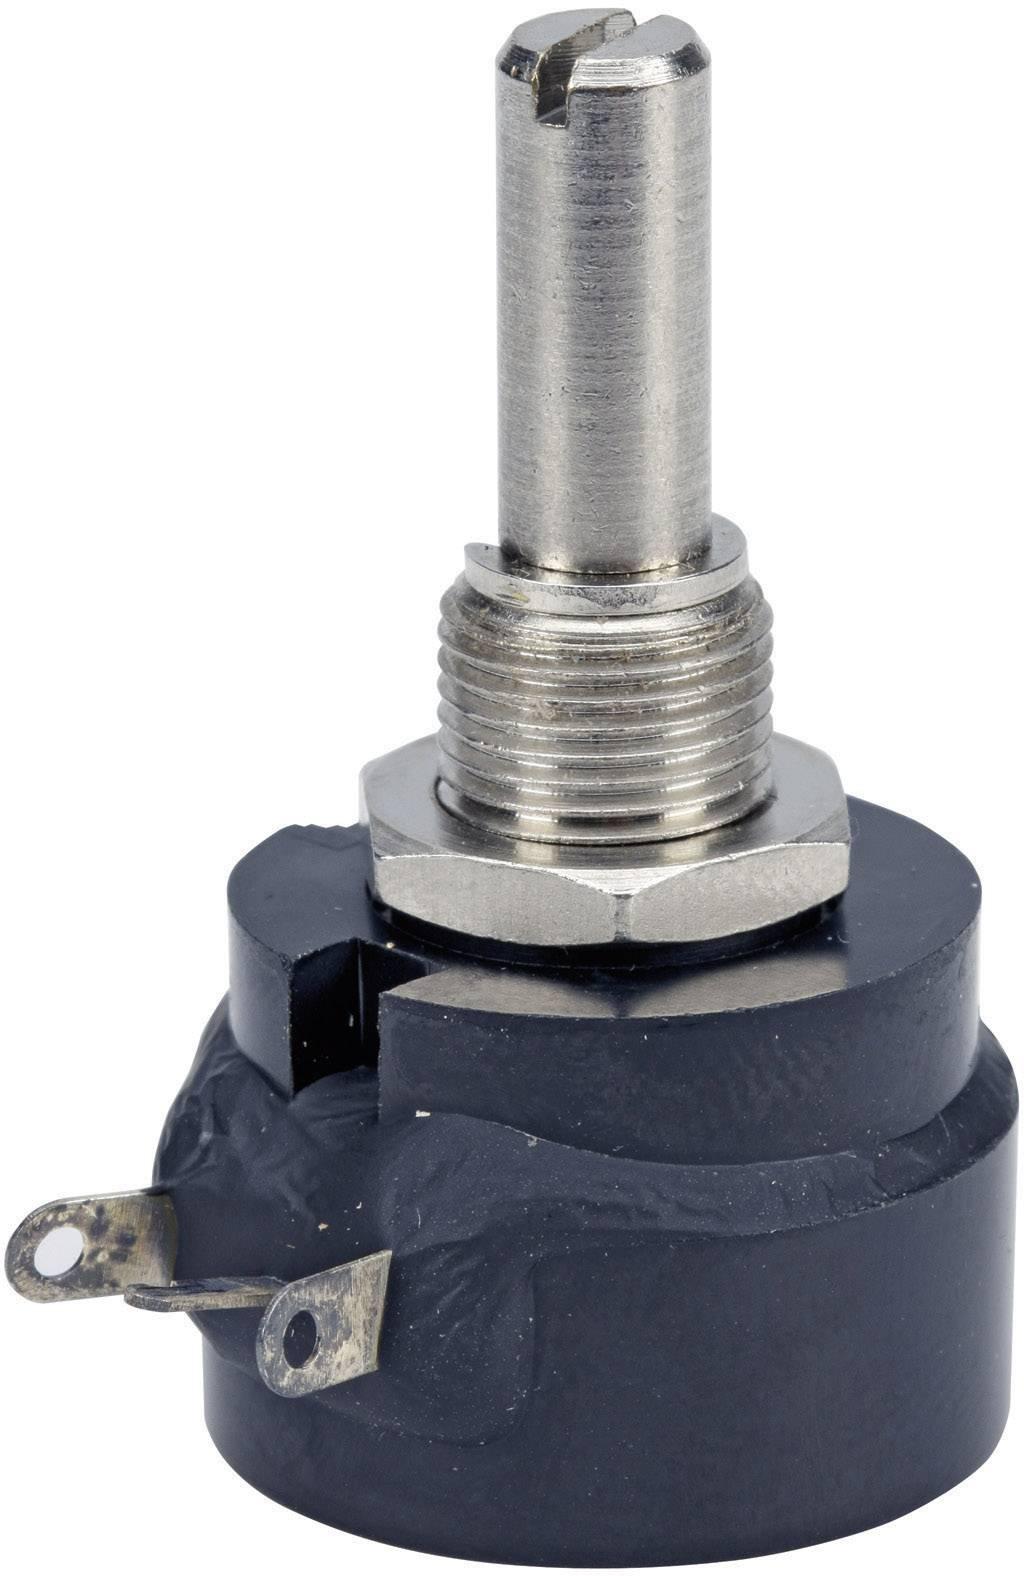 Drôtový potenciometer TT Electro, 3101206110, 100 Ω, 0.5 W, ± 10%